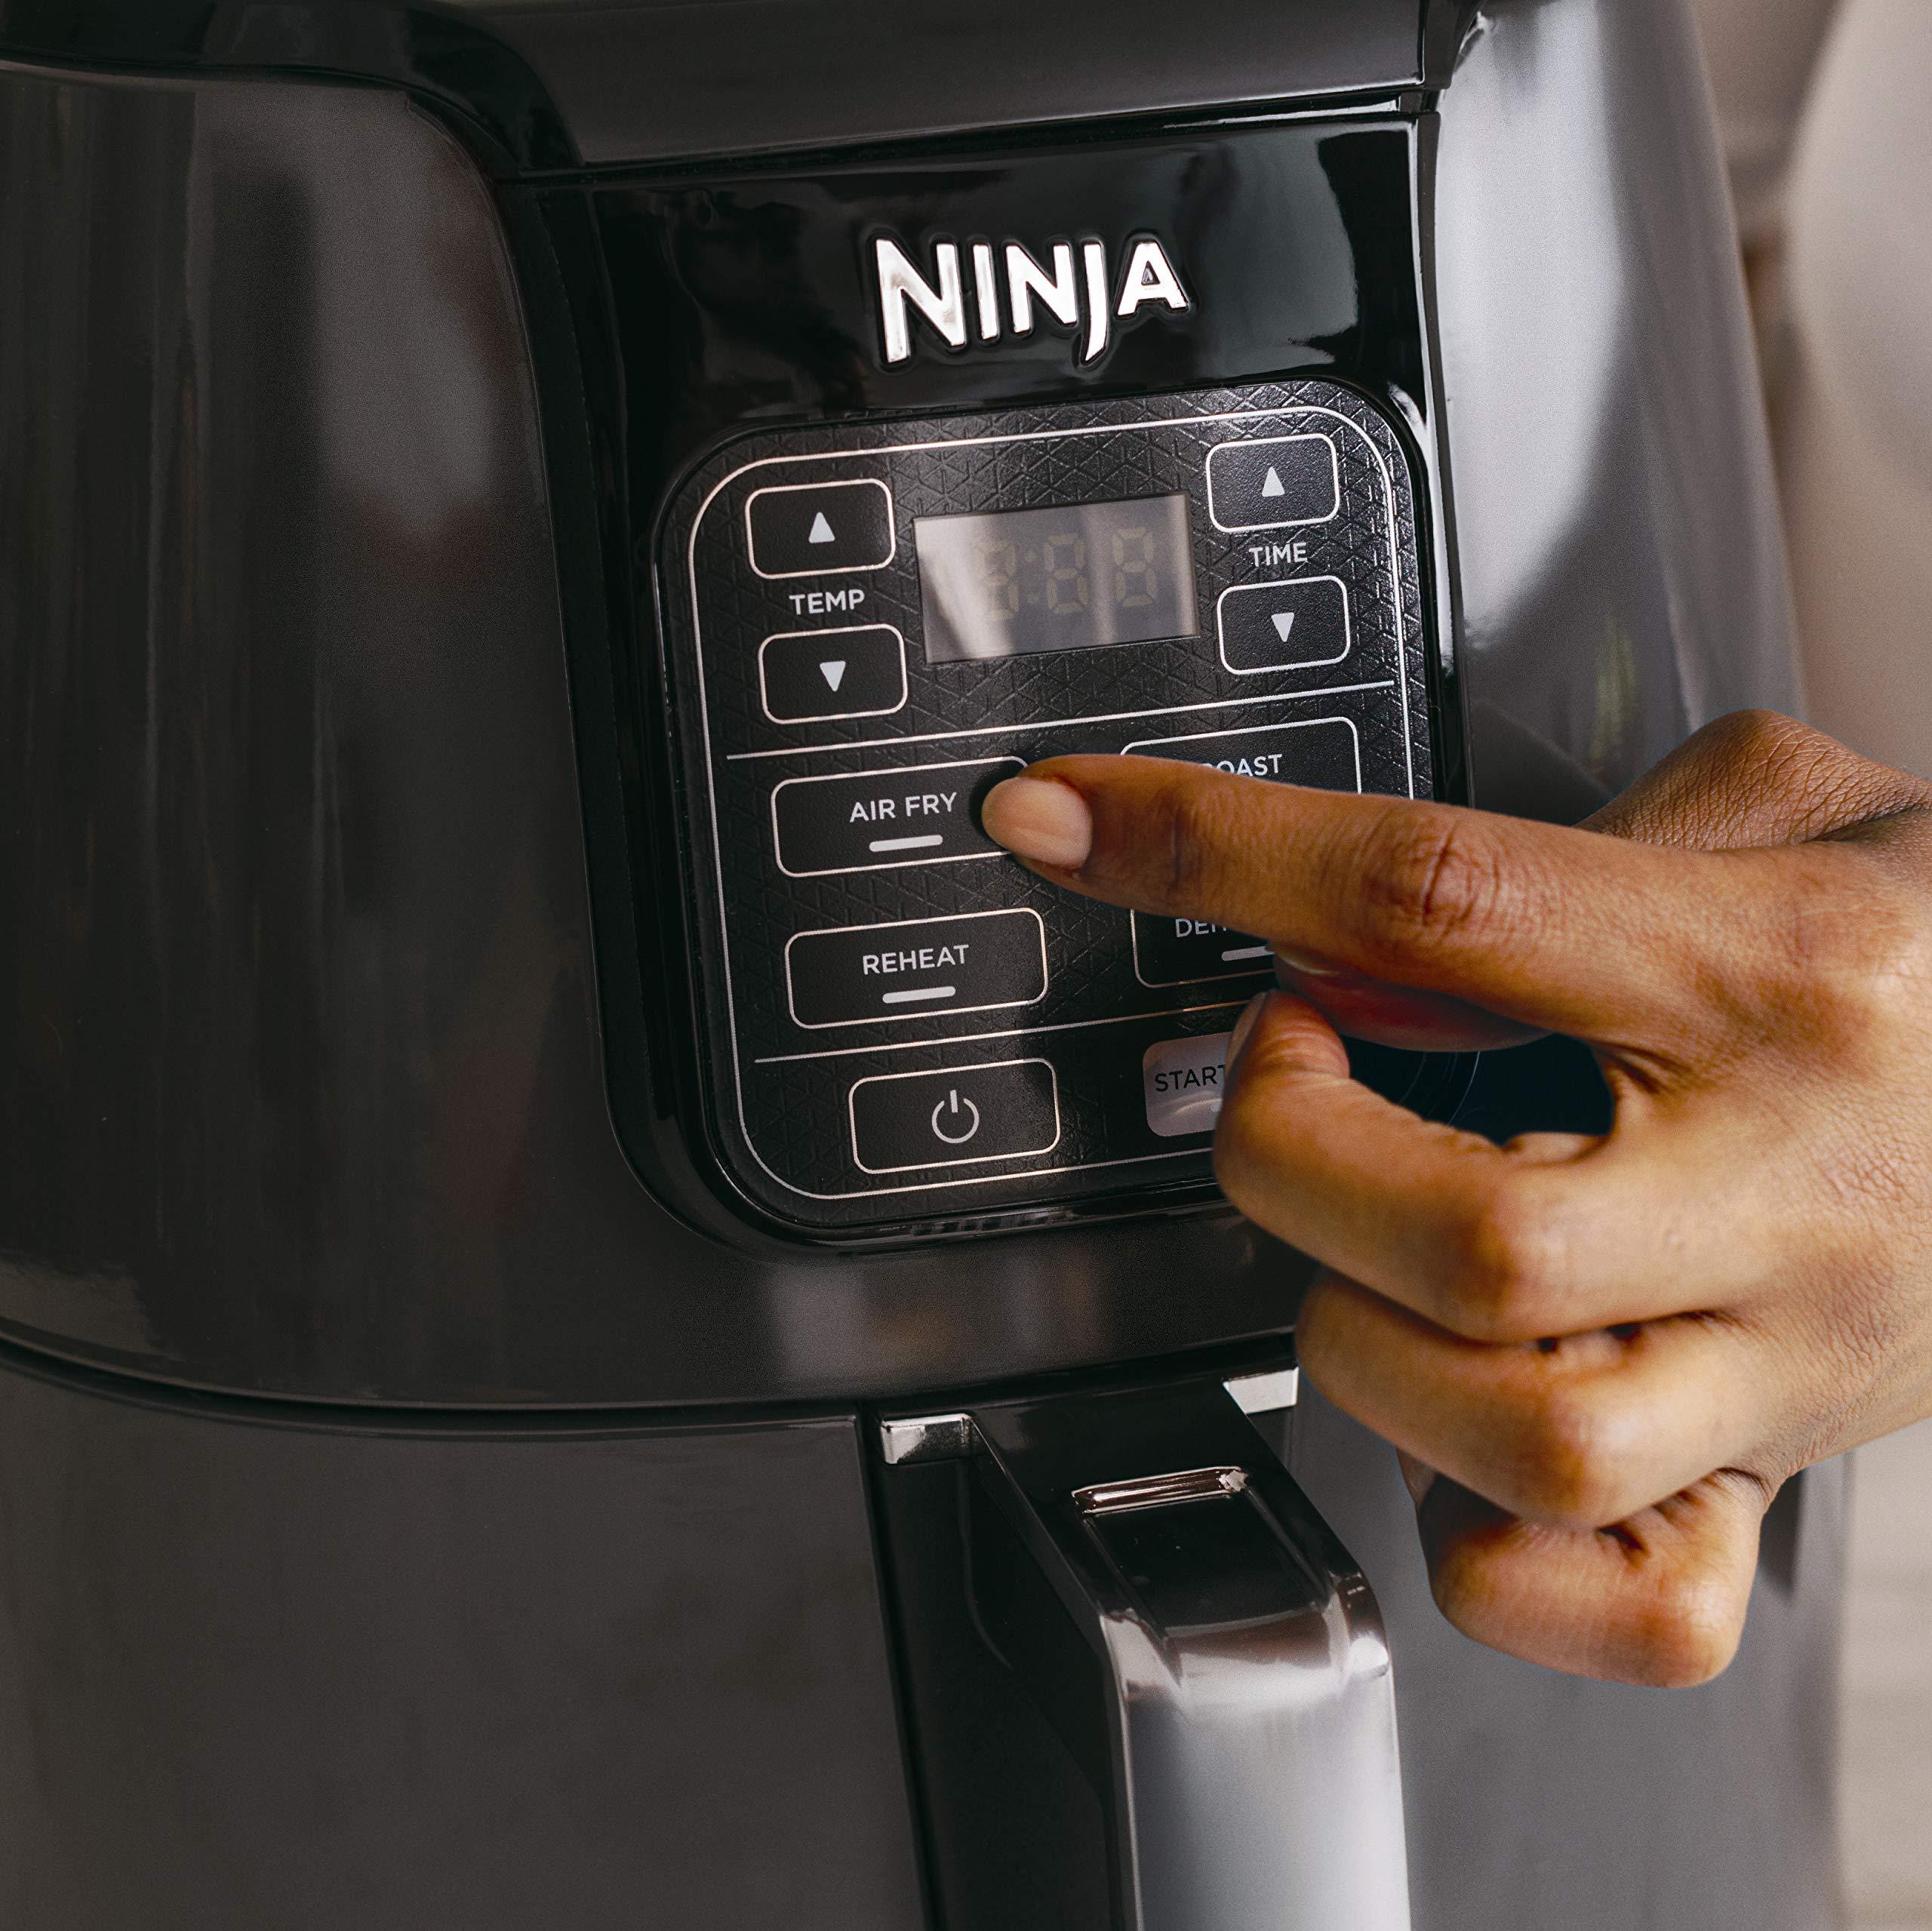 Ninja Air Fryer, 1550-Watt Programmable Base for Air Frying, Roasting, Reheating & Dehydrating with 4-Quart Ceramic Coated Basket (AF101), Black/Gray by Ninja (Image #3)